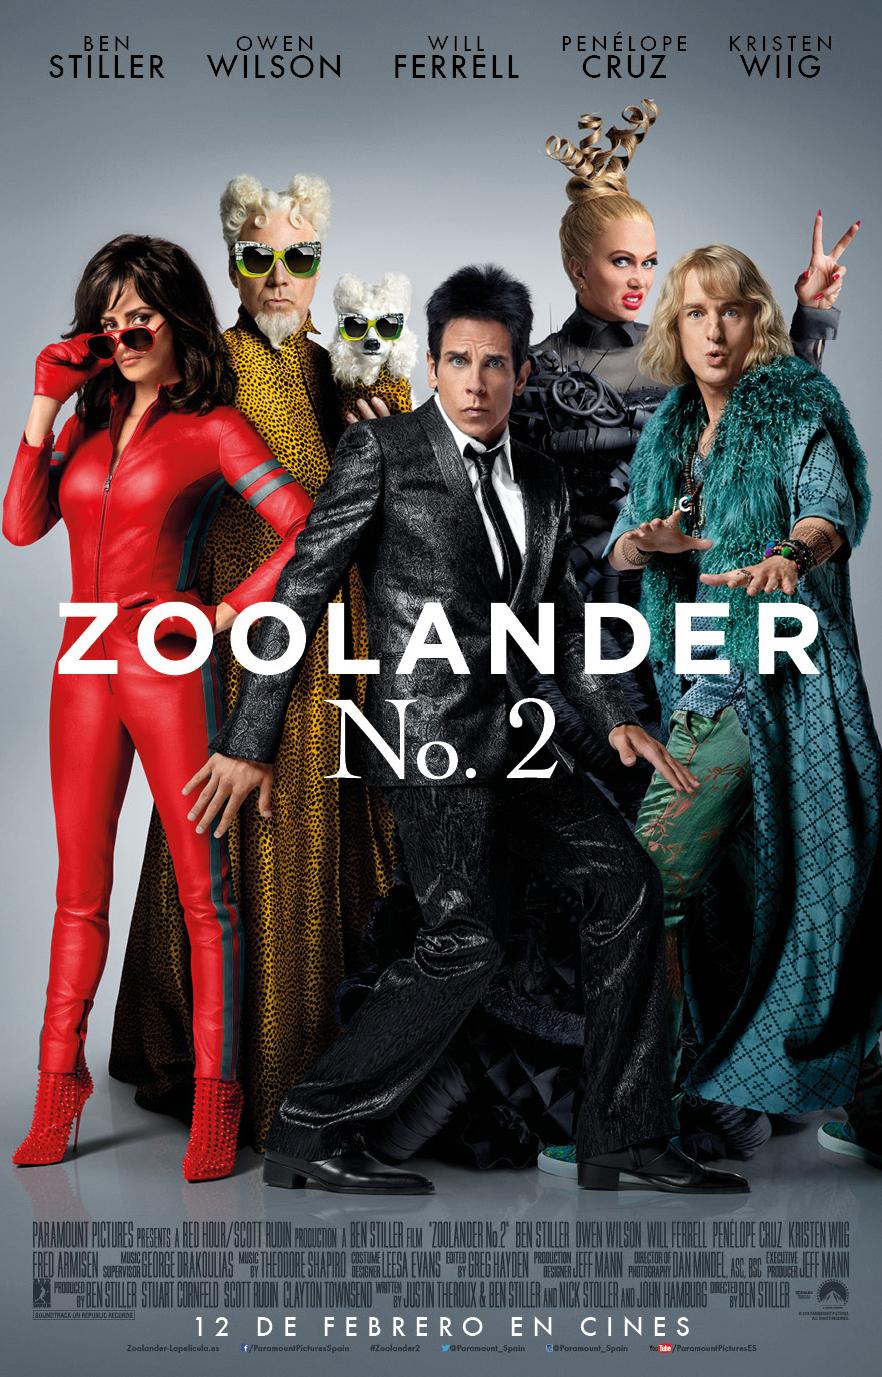 Zoolander2_Payoff_Spain_1-Sht_Online